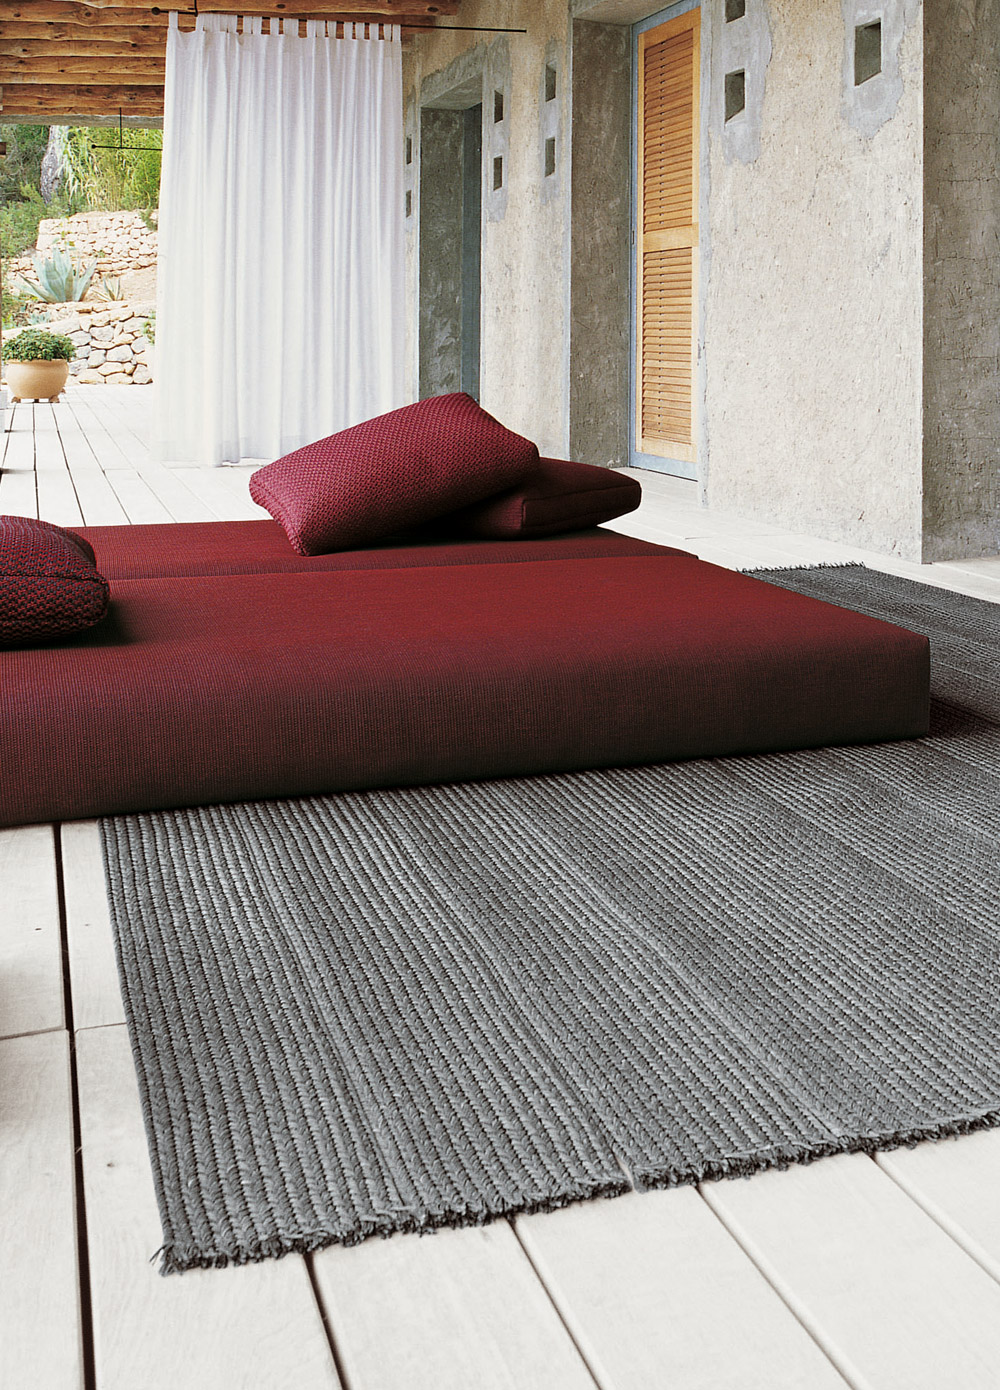 Sahara di paola lenti tappeti arredamento mollura for Paola lenti